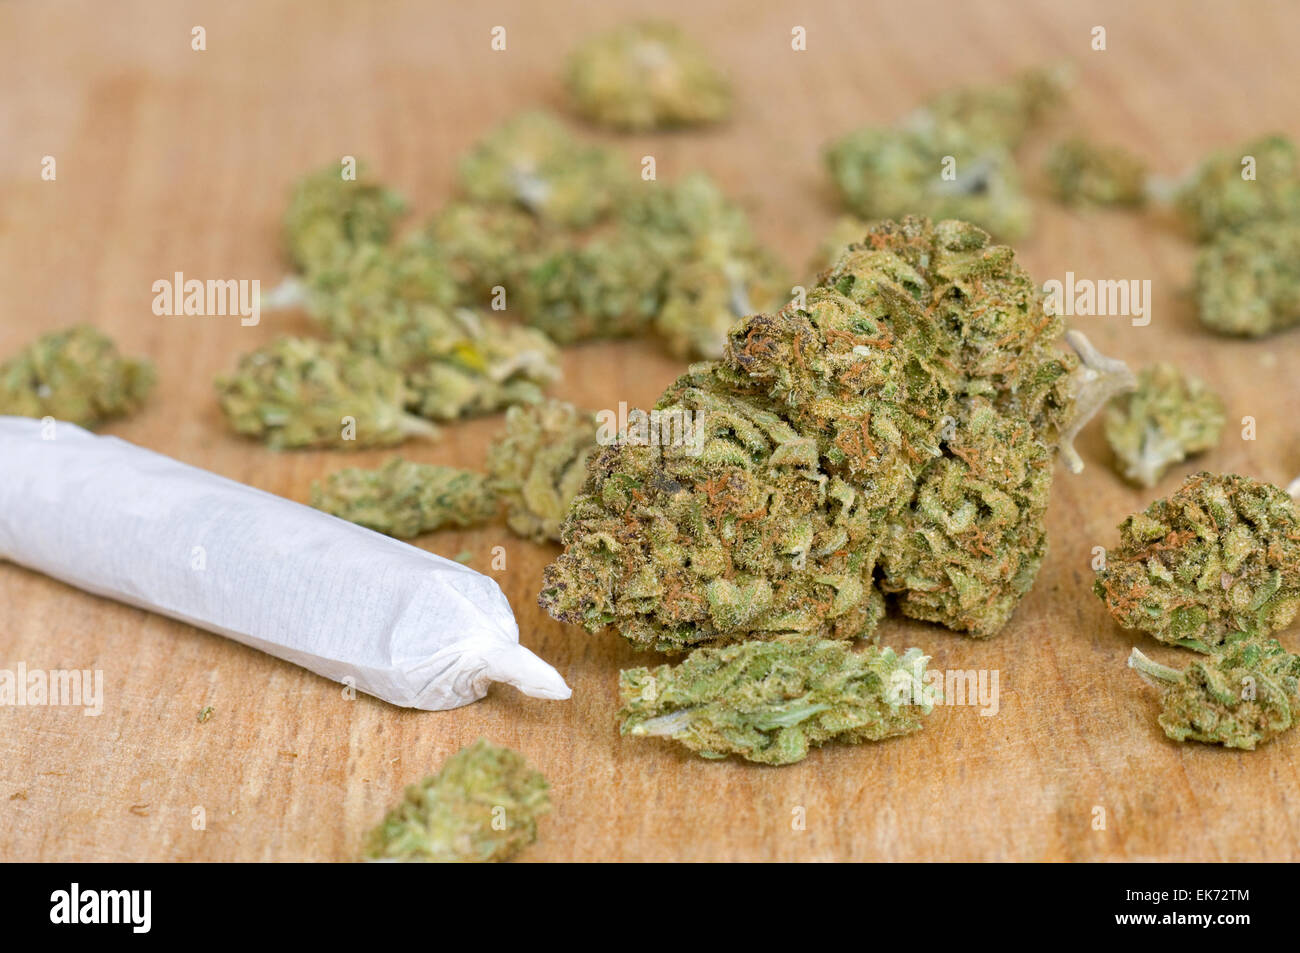 Dry marijuana buds and joint - Stock Image